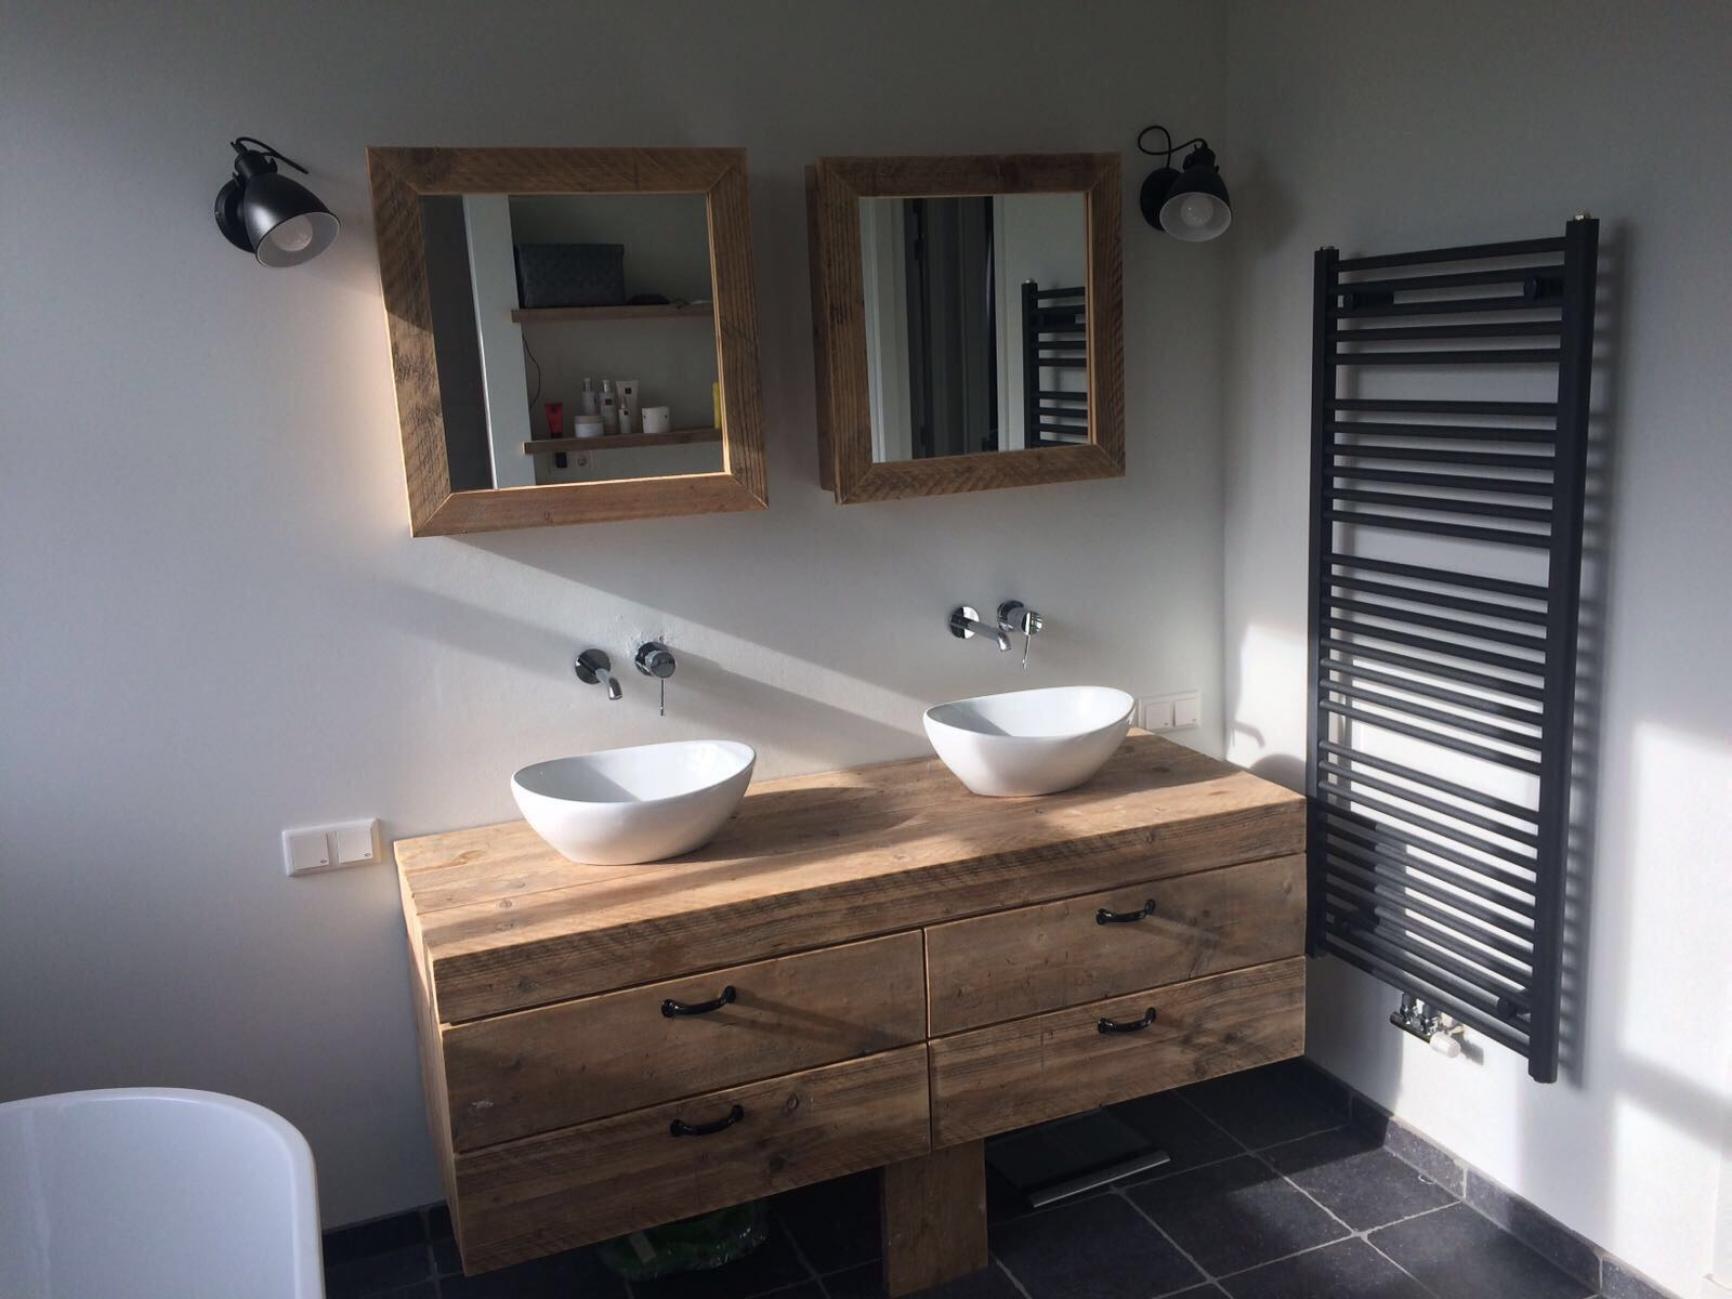 Badkamer Met Steigerhout : Steigerhout bakel badkamer meubel